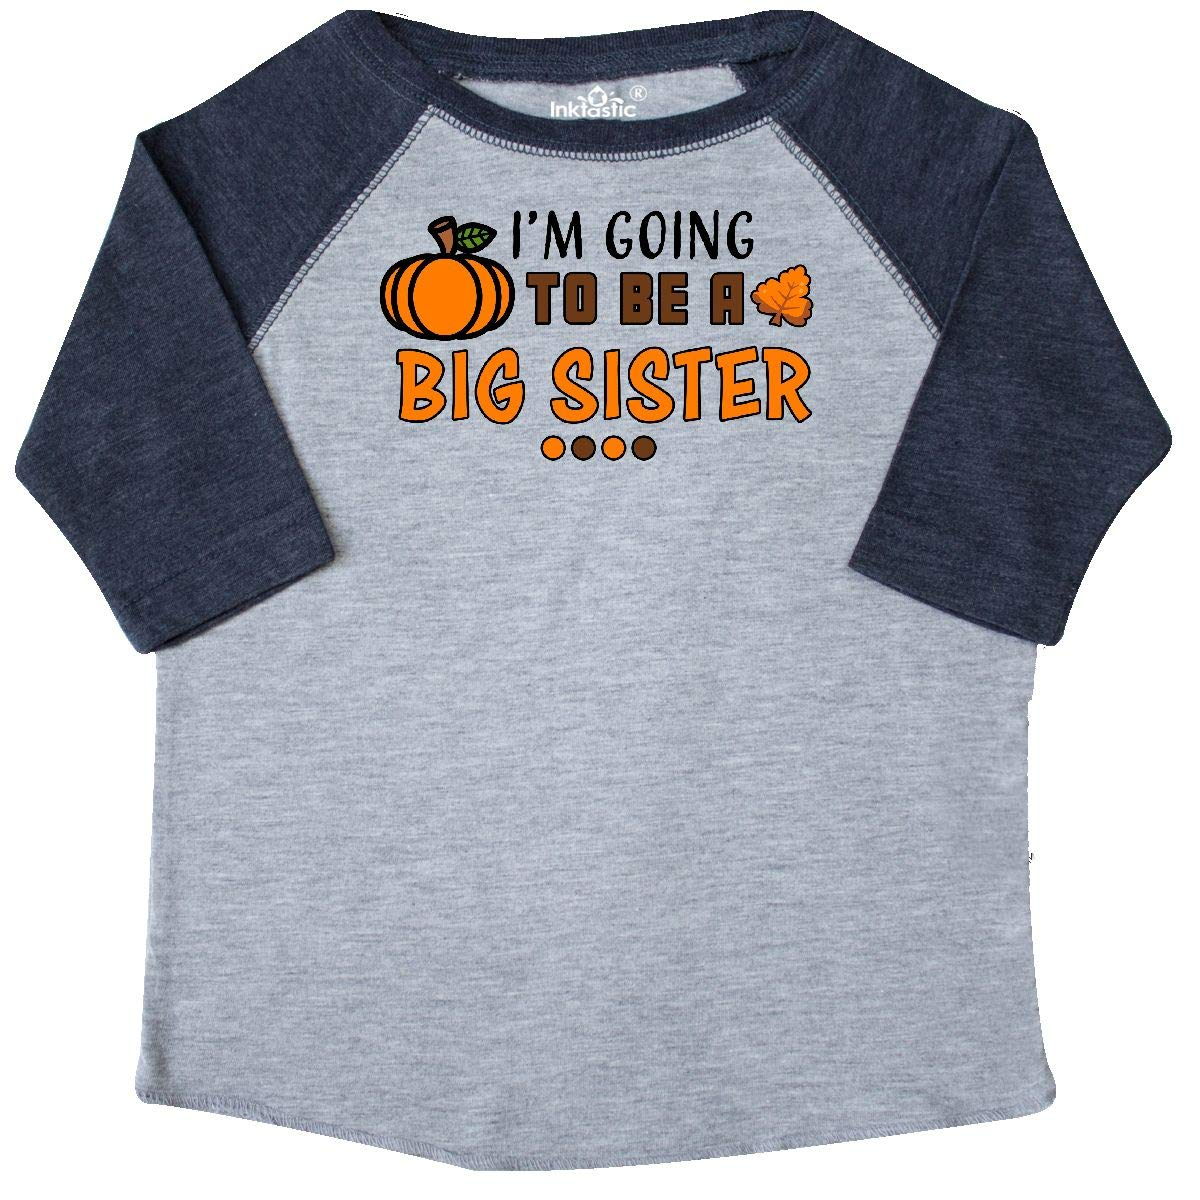 inktastic Toddler T-Shirt